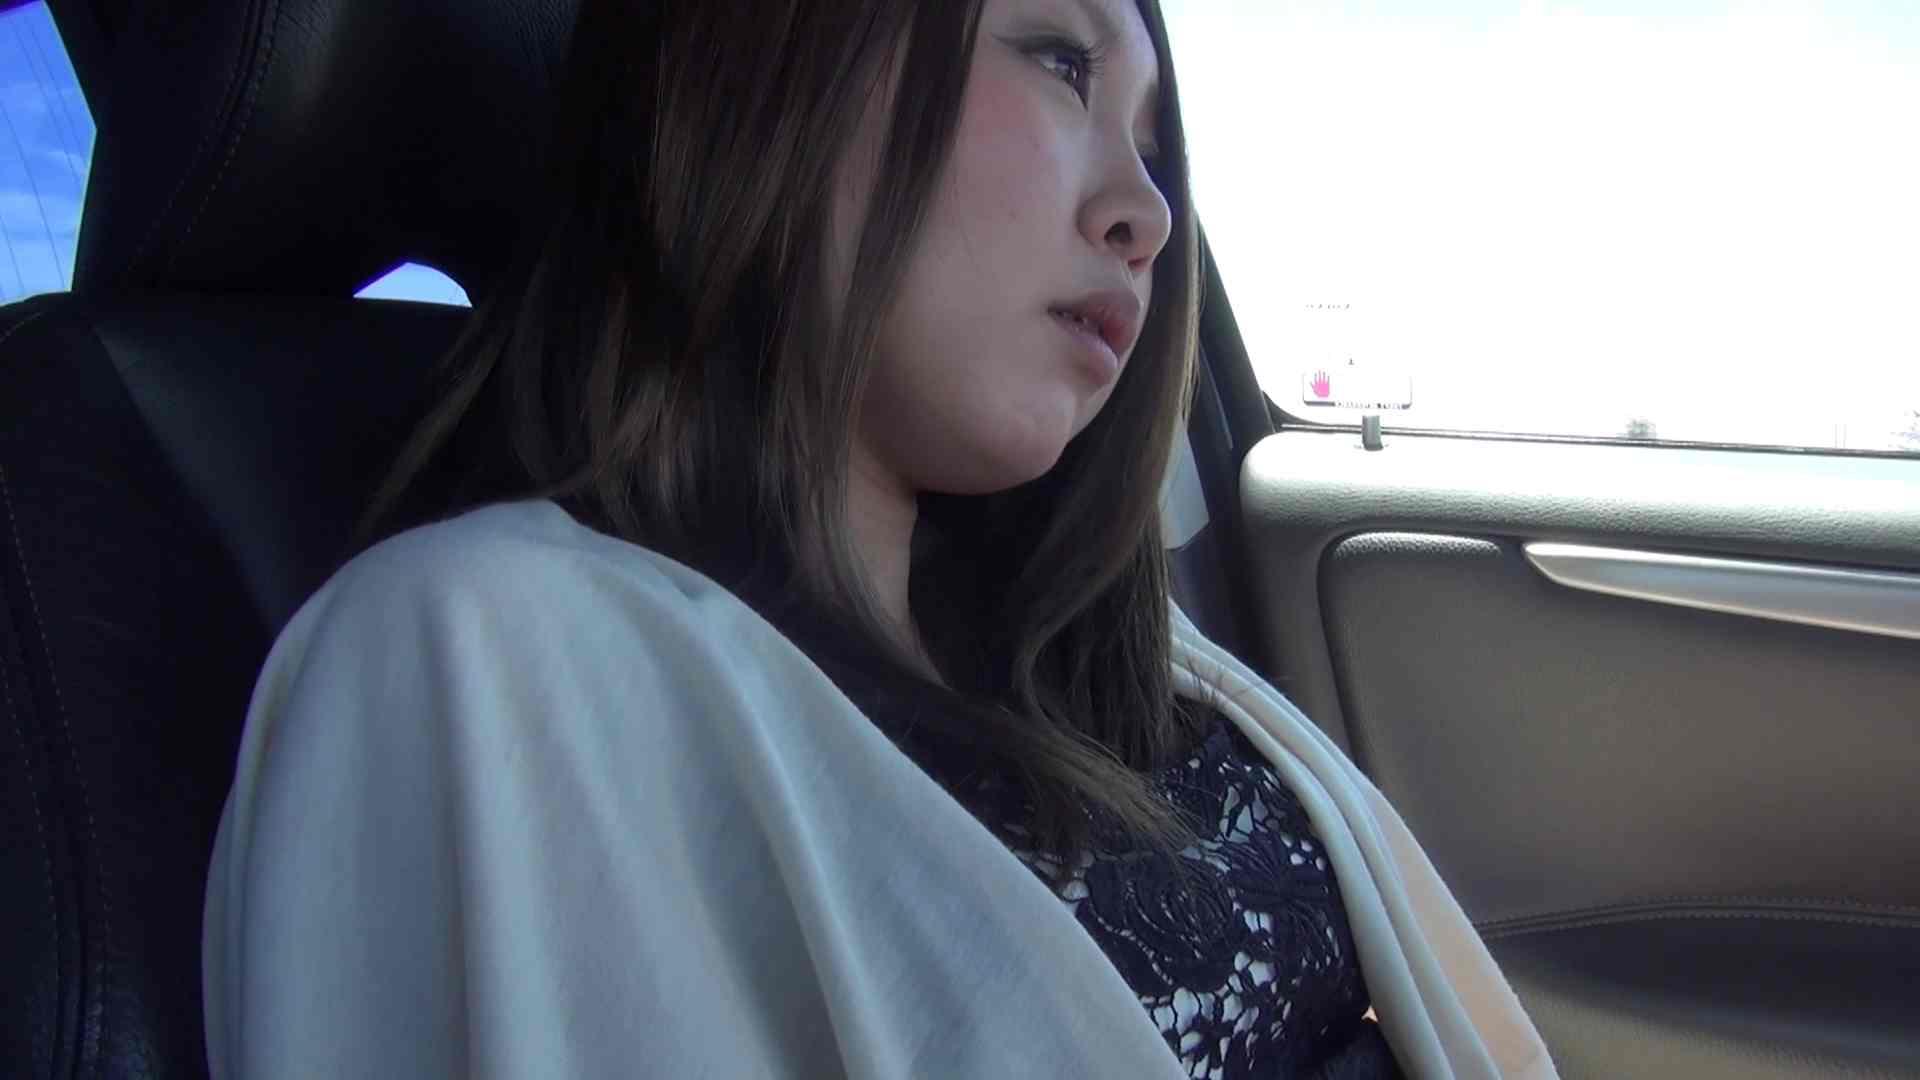 episode6 ドライブ中に・・・妻に強せいオナニー オナニー  106pic 37